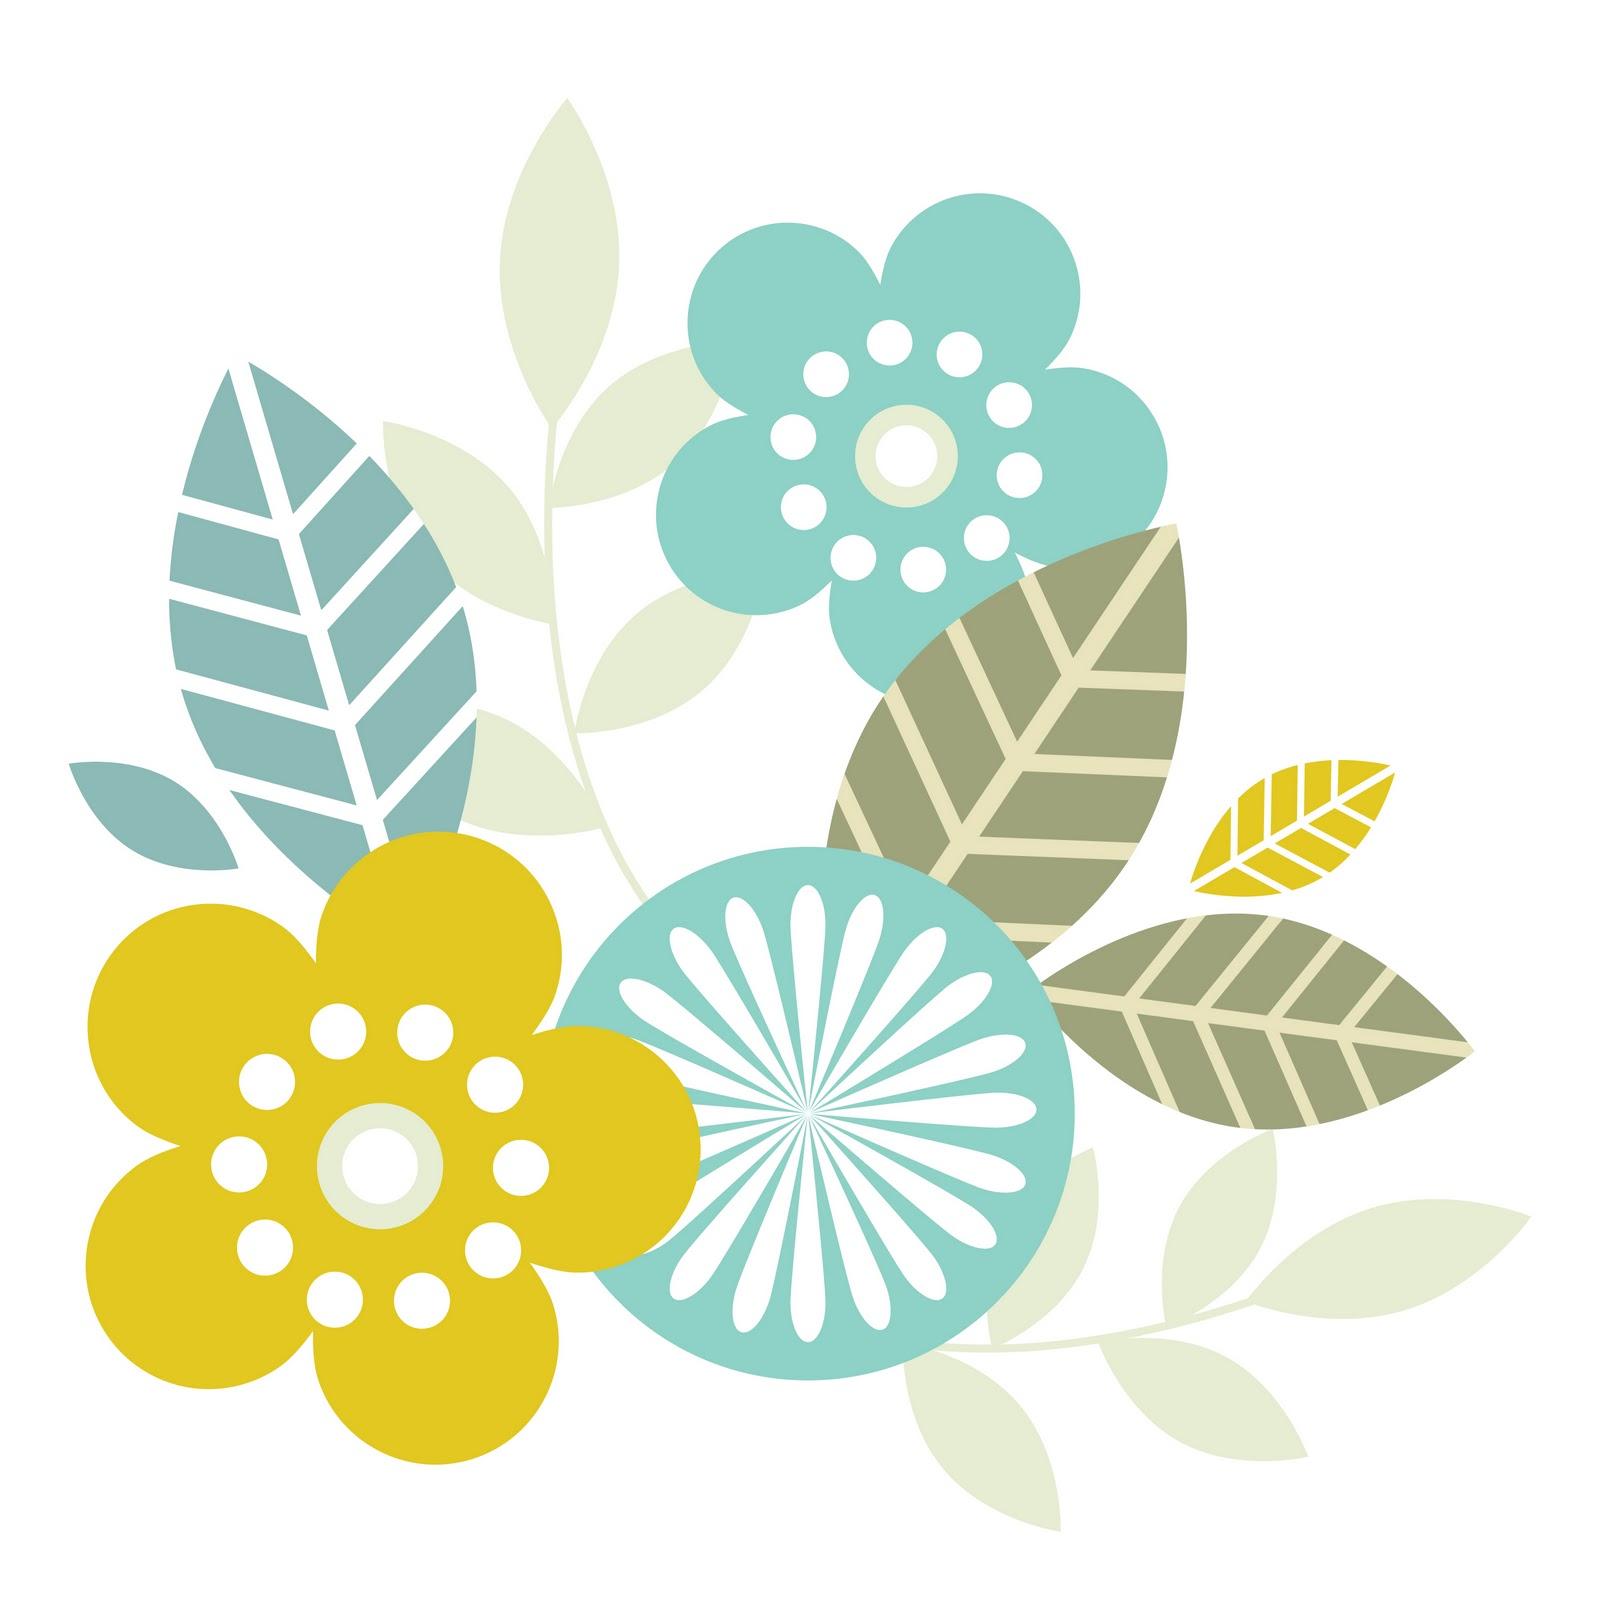 http://3.bp.blogspot.com/_IAwBD_Dbgfg/TUsy72LMyAI/AAAAAAAAB3E/LWpyFBLoR0k/s1600/Cool-Floral-green-aquas.jpg